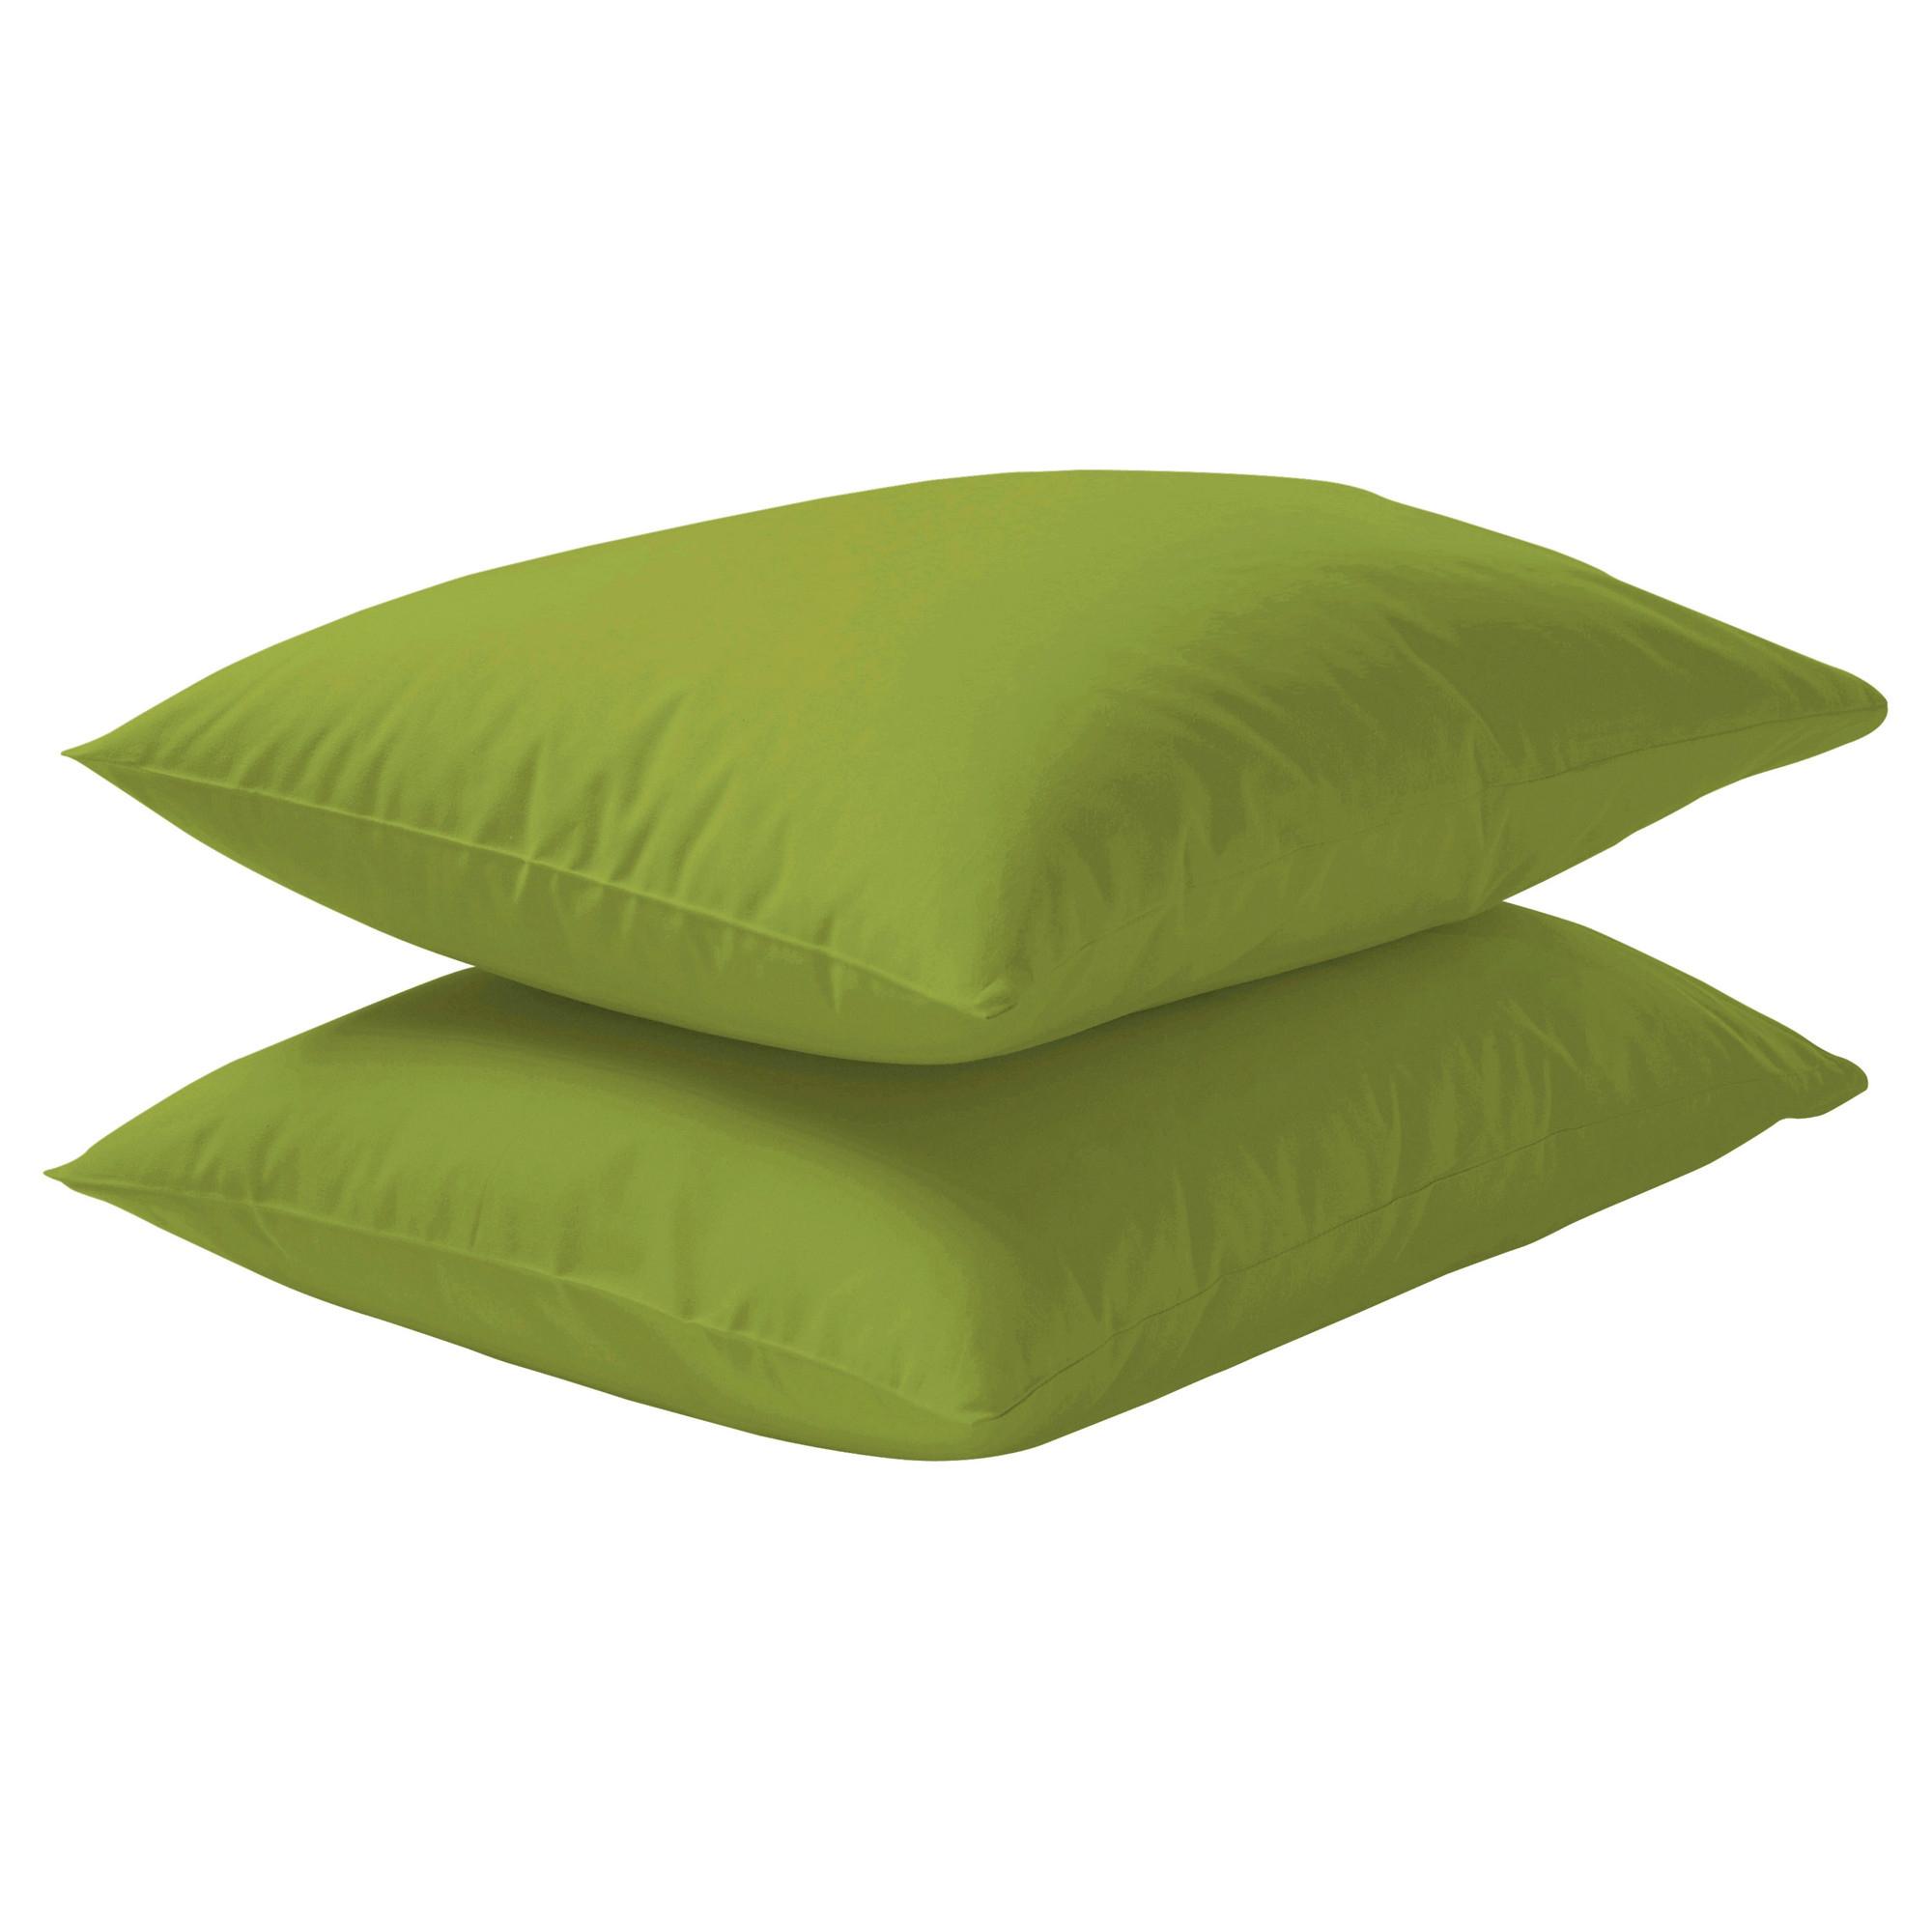 dvala 50x80 funda para almohada verde vivo 2 unidades. Black Bedroom Furniture Sets. Home Design Ideas